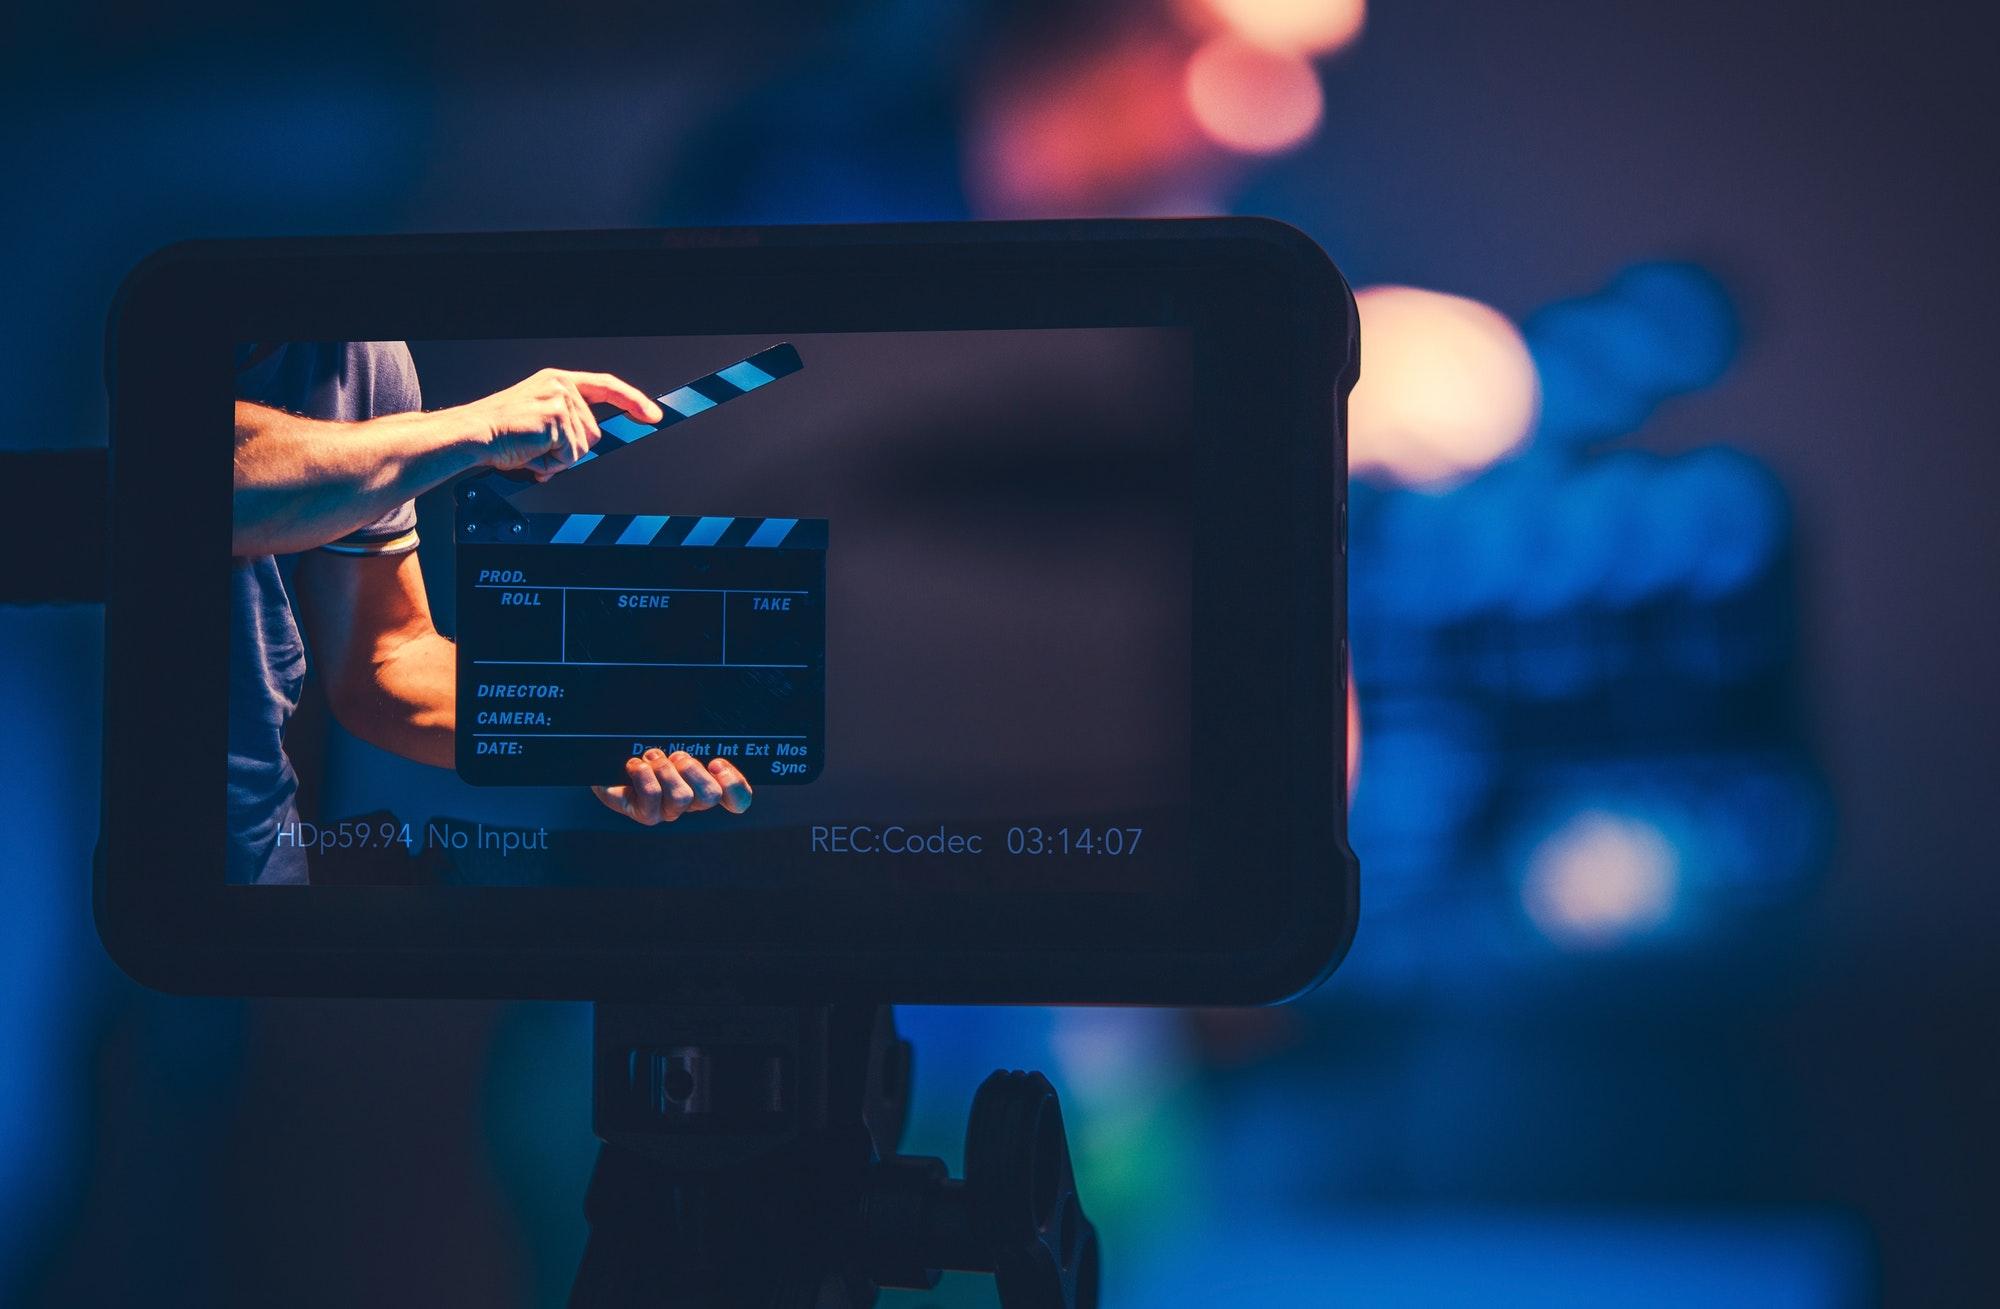 Otvoren je konkurs za prijem filmova za VIVA FILM FESTIVAL